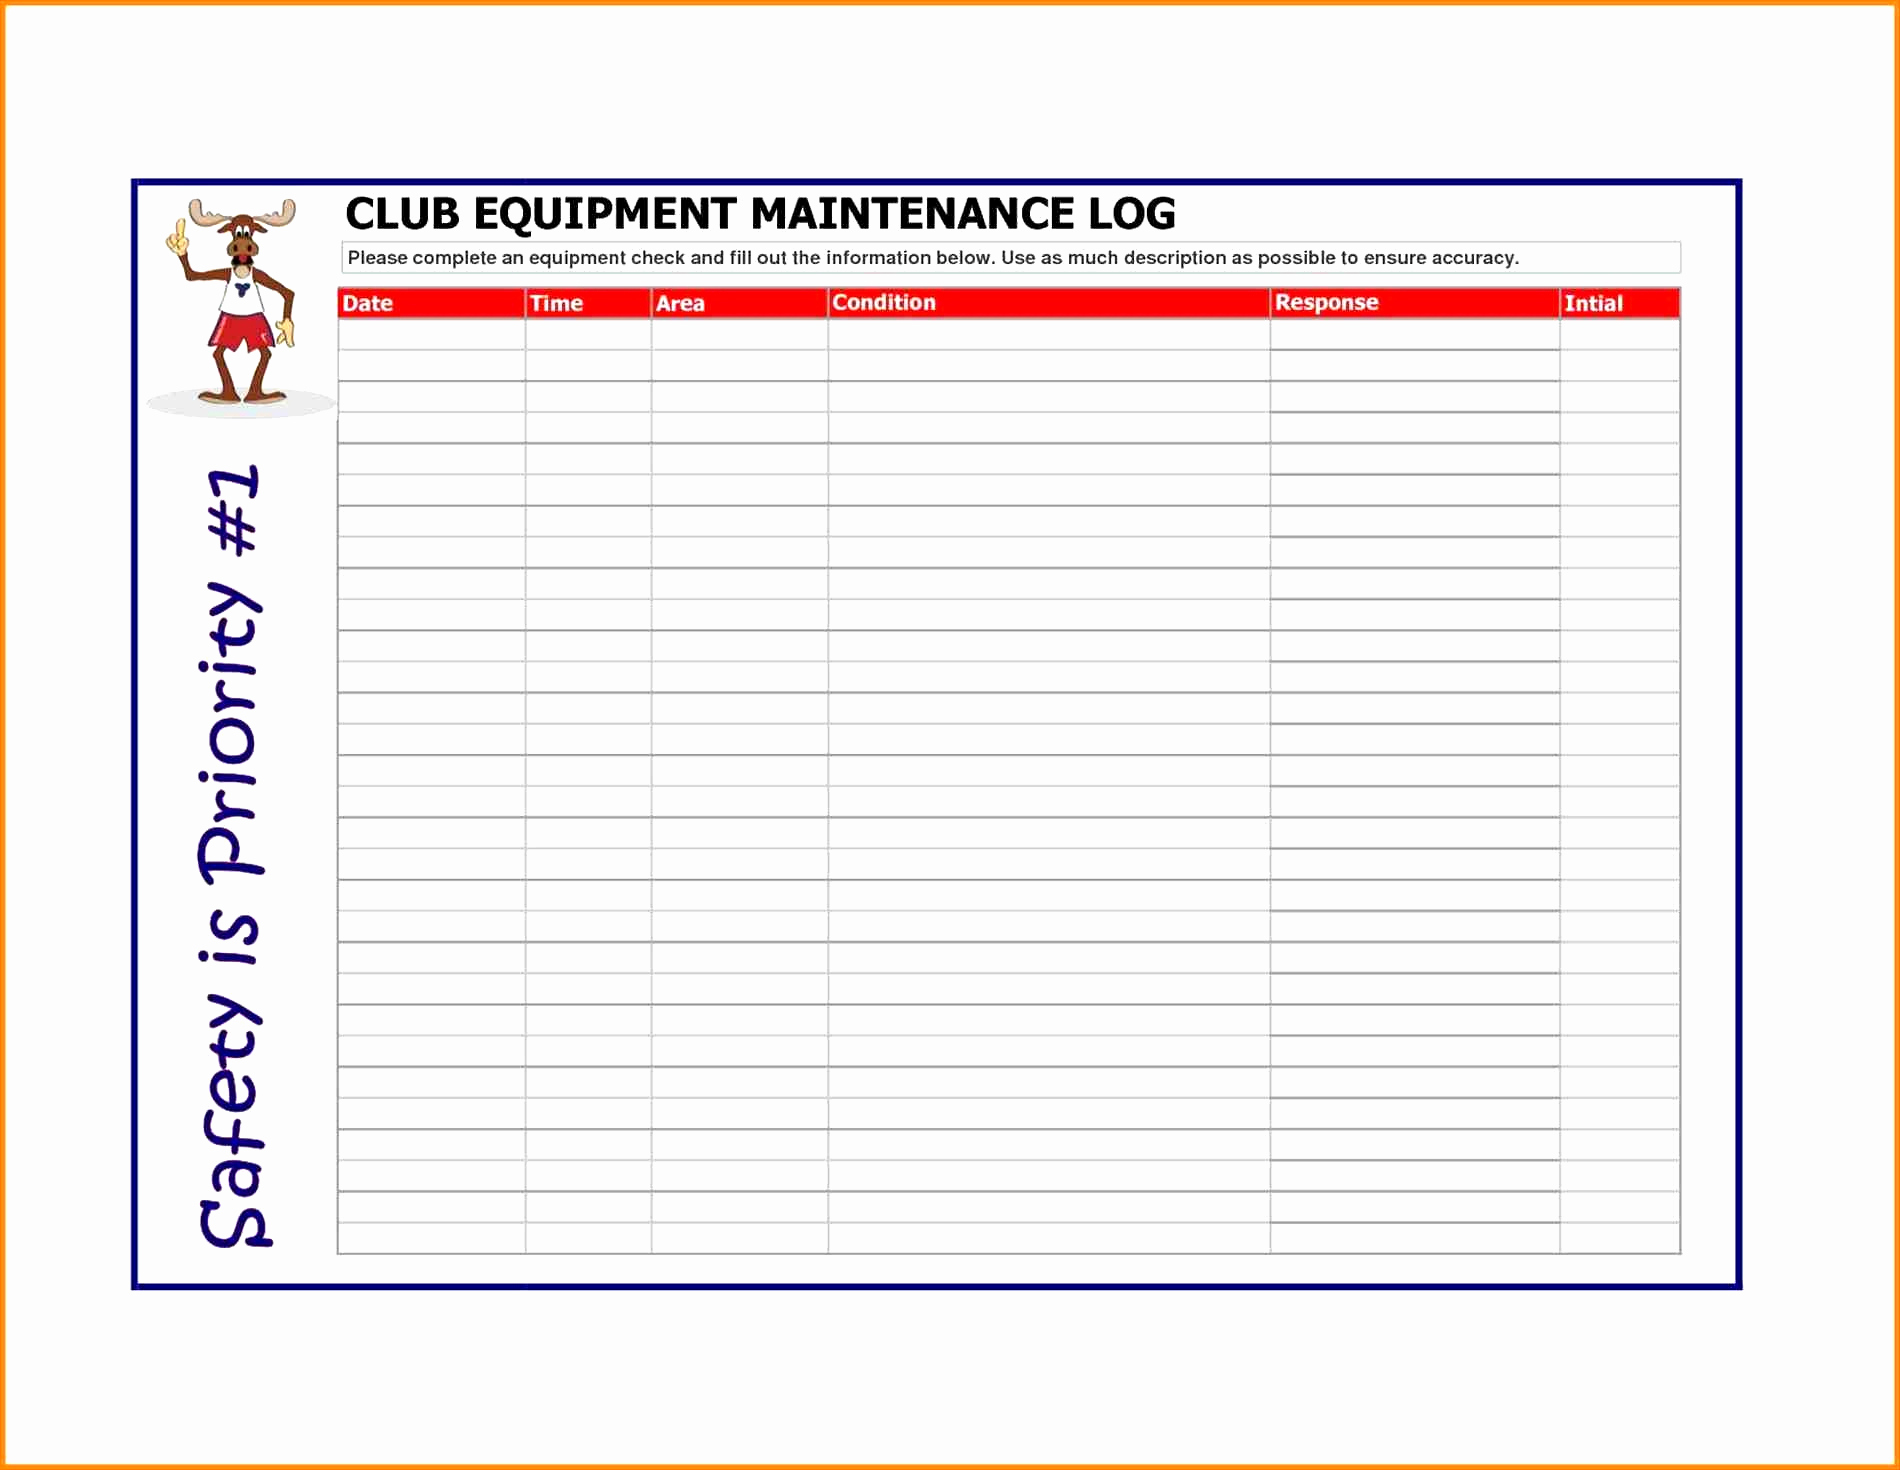 Equipment Maintenance Spreadsheet Intended For Fleet Vehicle Maintenance Log Template Fresh Excel Auto Maintenance